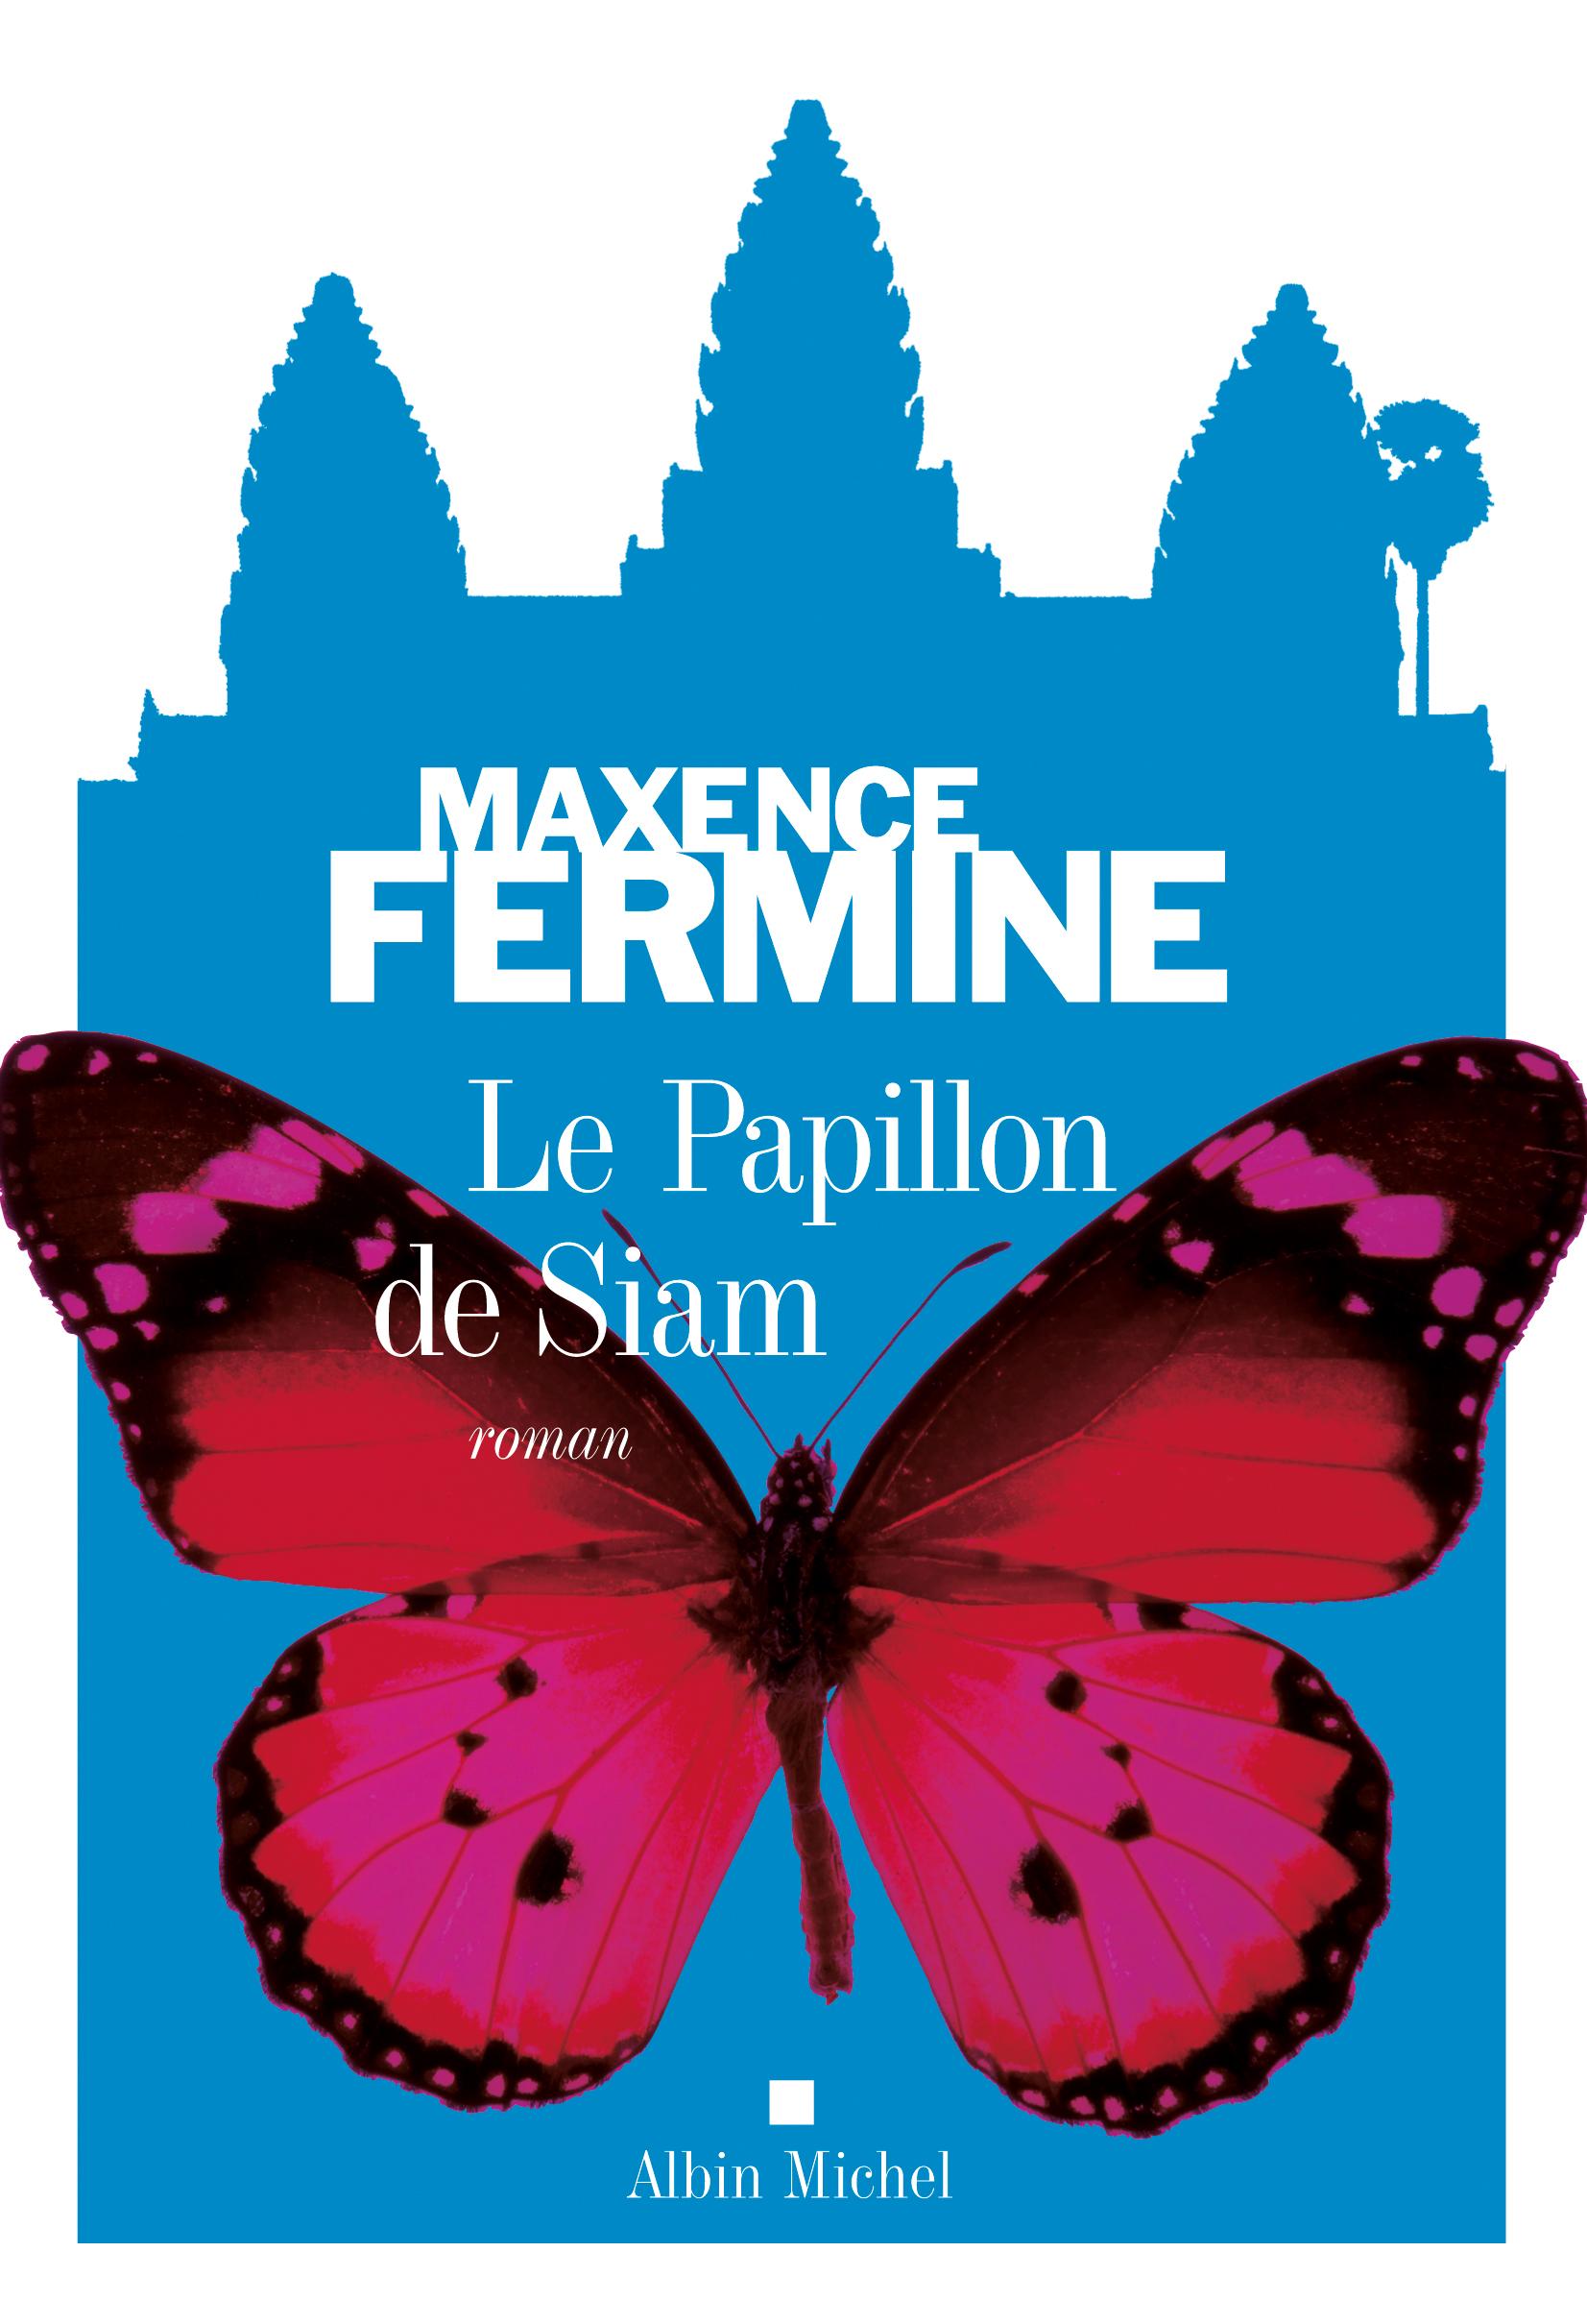 Le Papillon de Siam de Maxence Fermine.